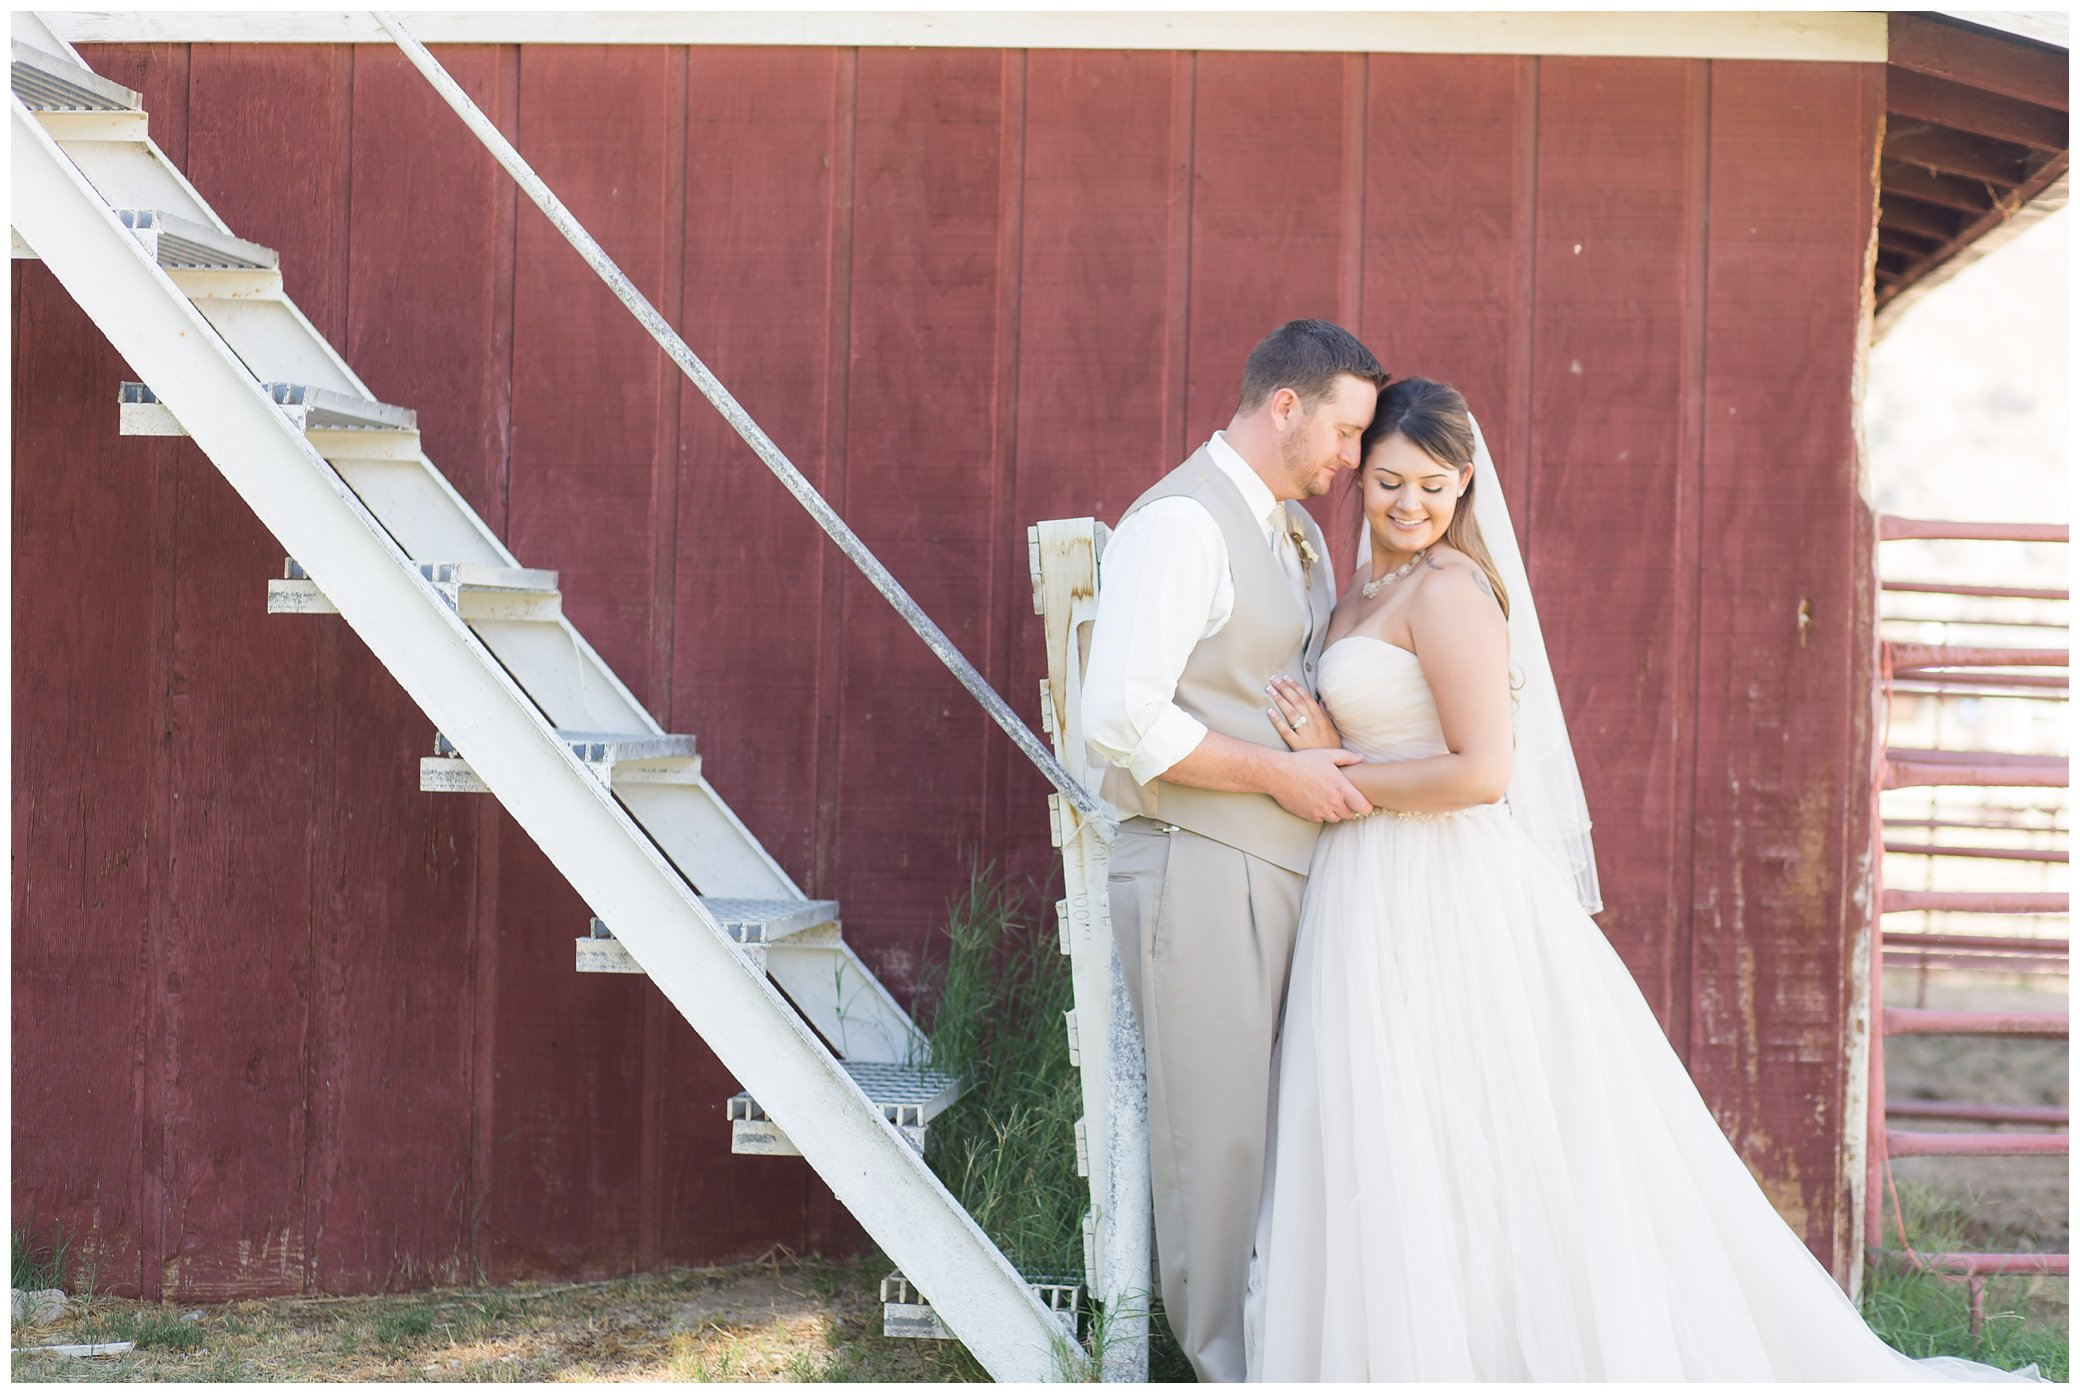 Rustic Blush Barn Wedding   North NJ Wedding Photography